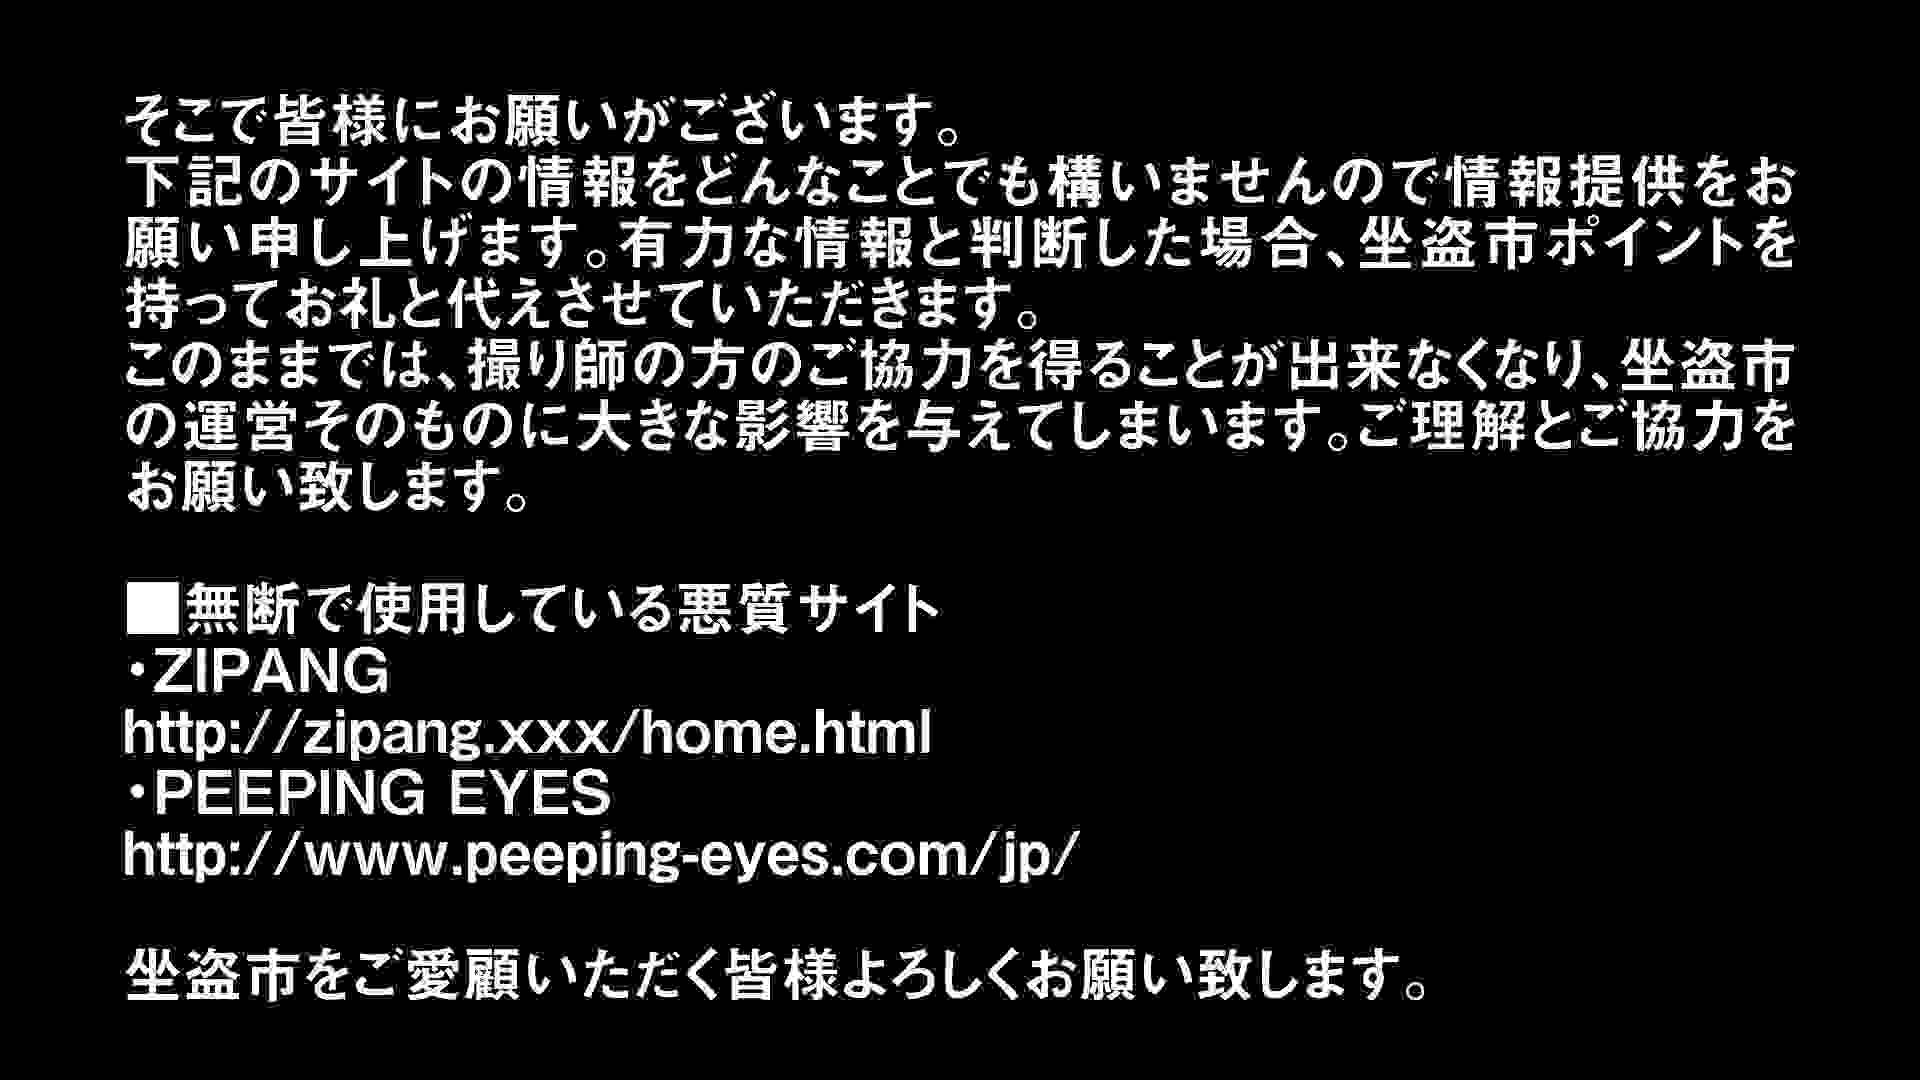 Aquaな露天風呂Vol.301 盗撮  112連発 30